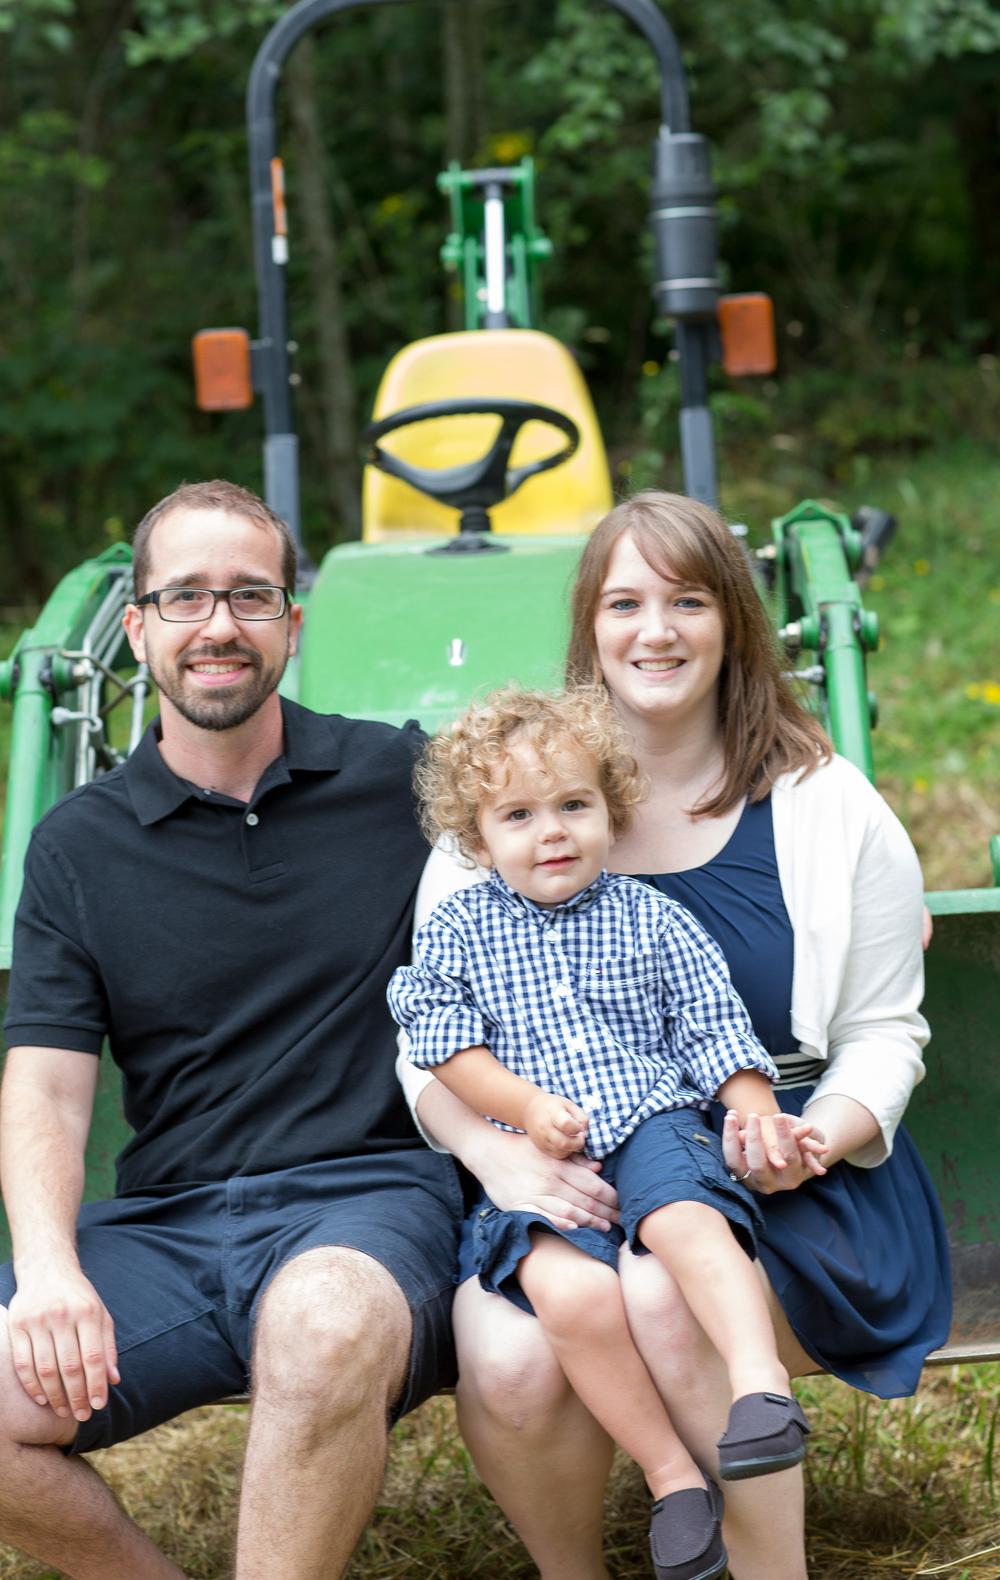 Schiffner family photos 2016 (166 of 179).JPG